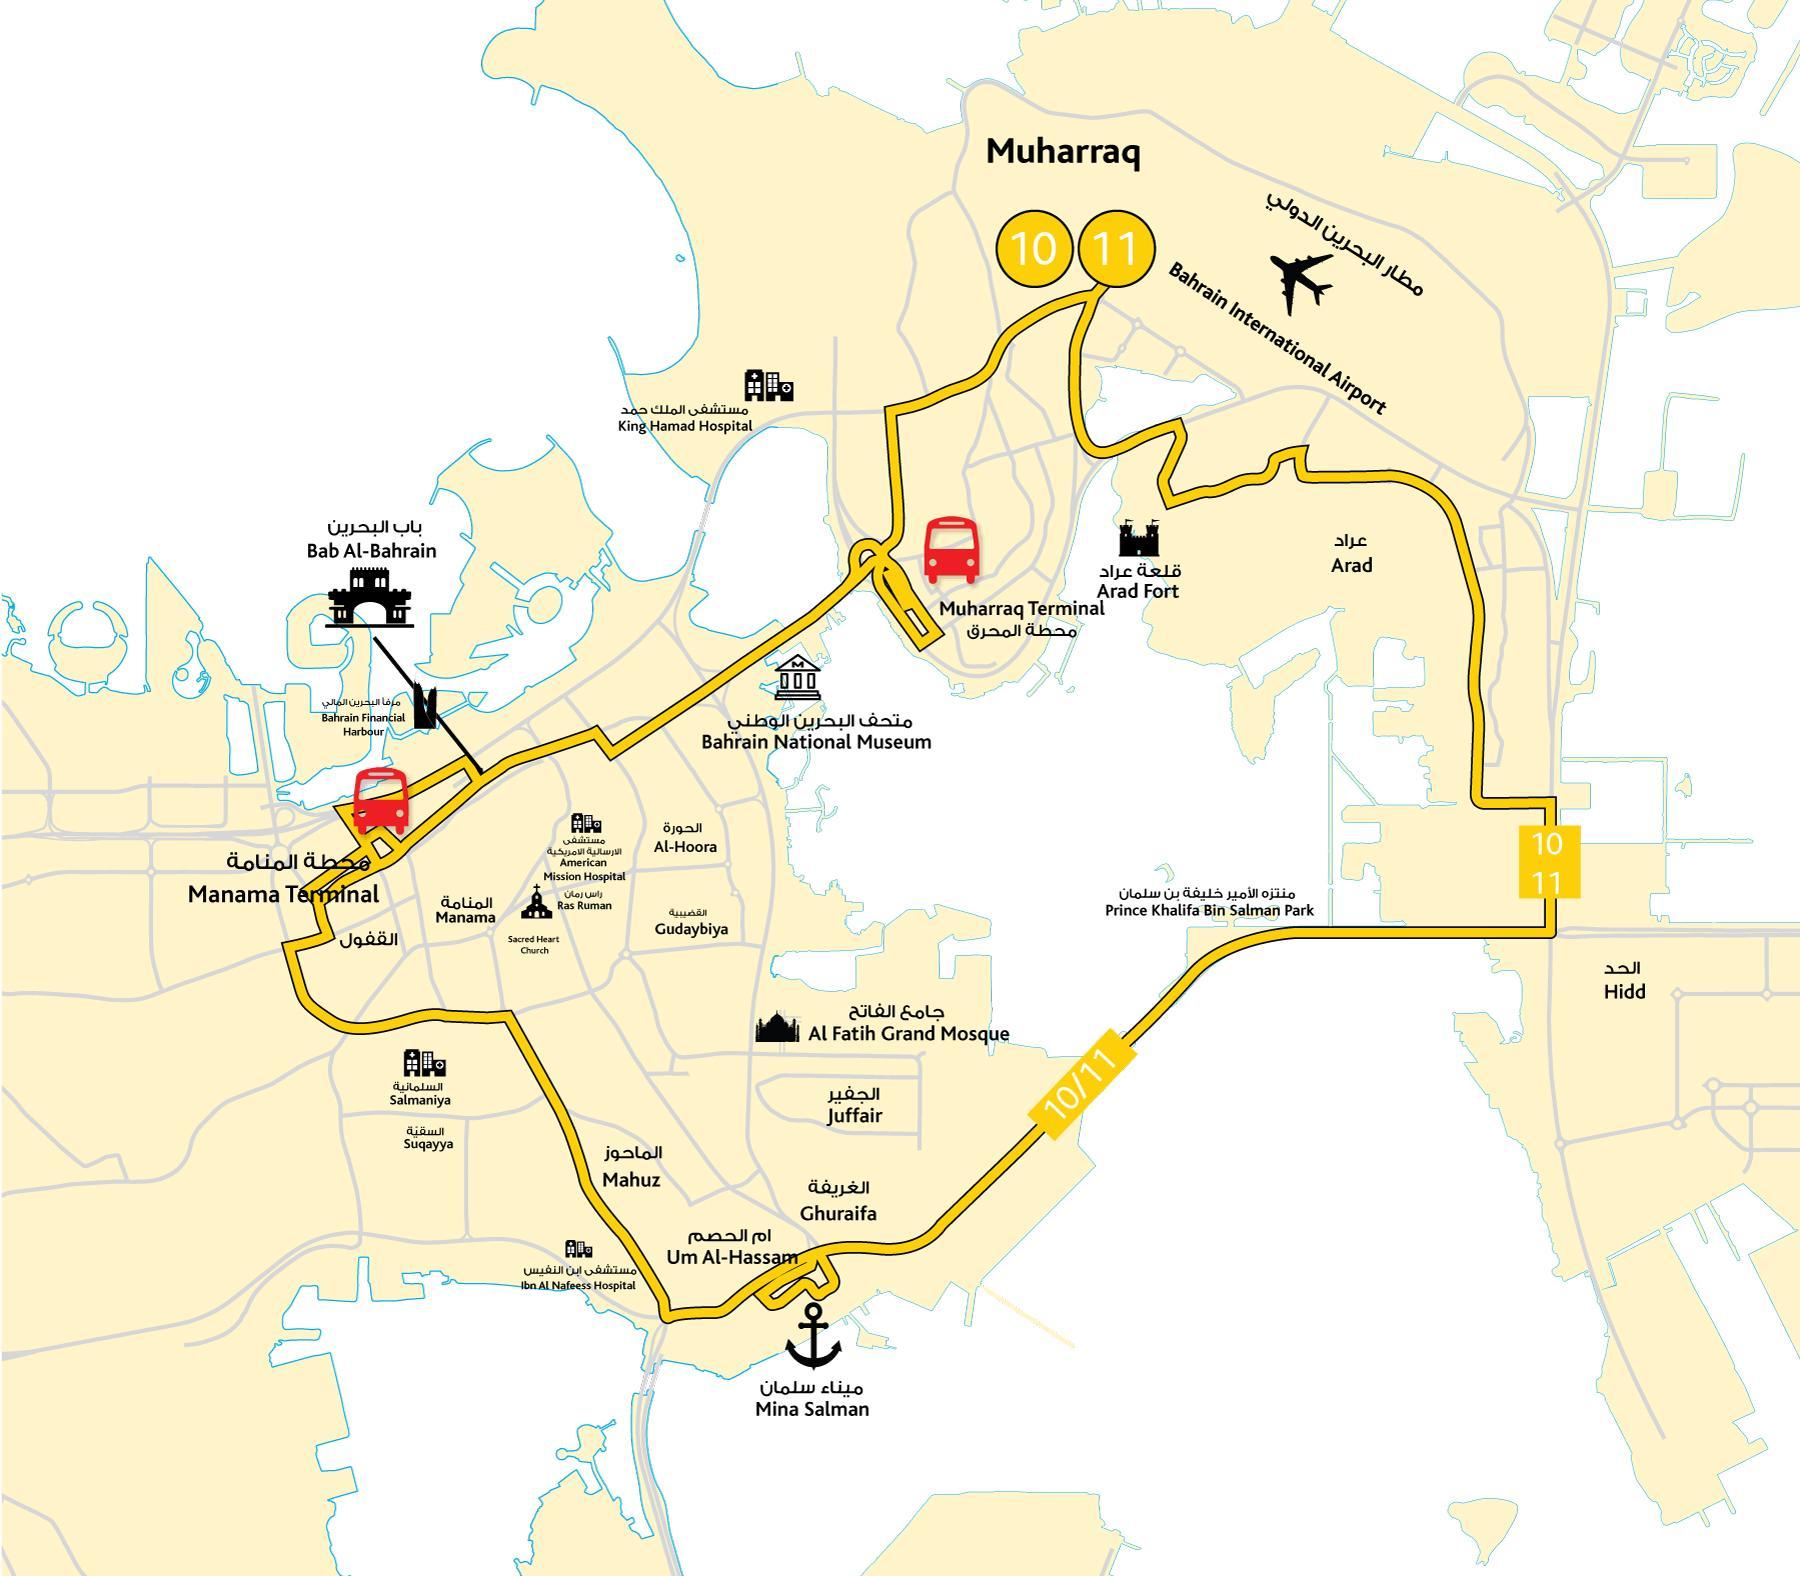 bahrain road map download Bahrain Driving School Road Map Map Of Bahrain Driving School bahrain road map download